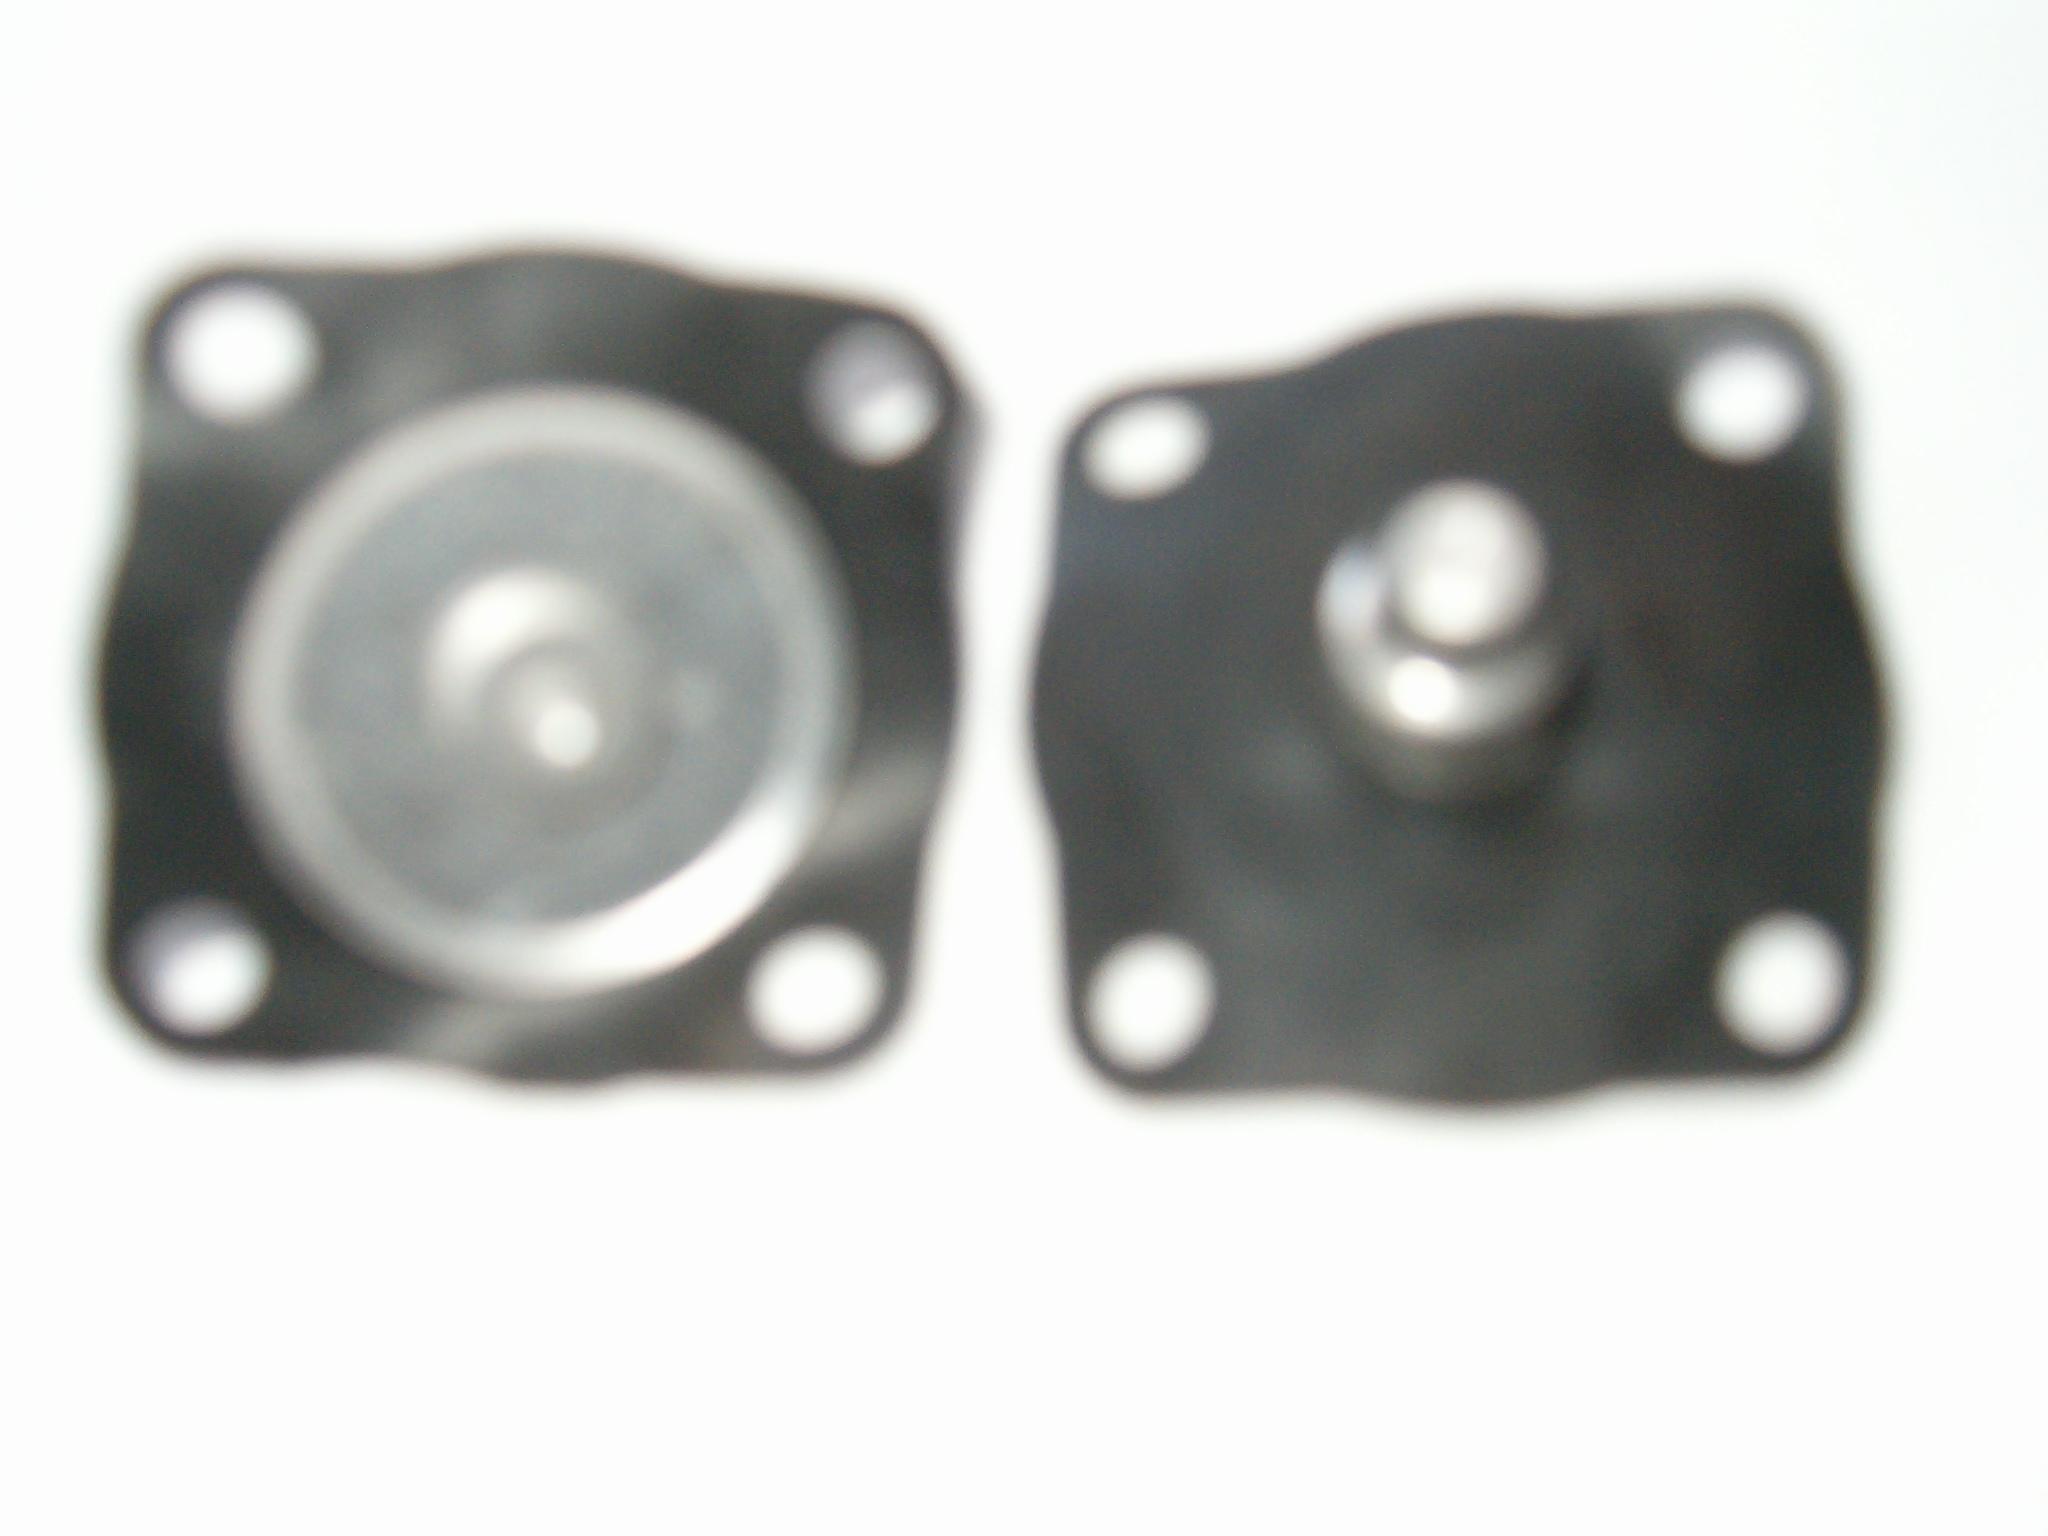 SUZUKI Lets Benzincsap membrán,2T - 1490 Ft